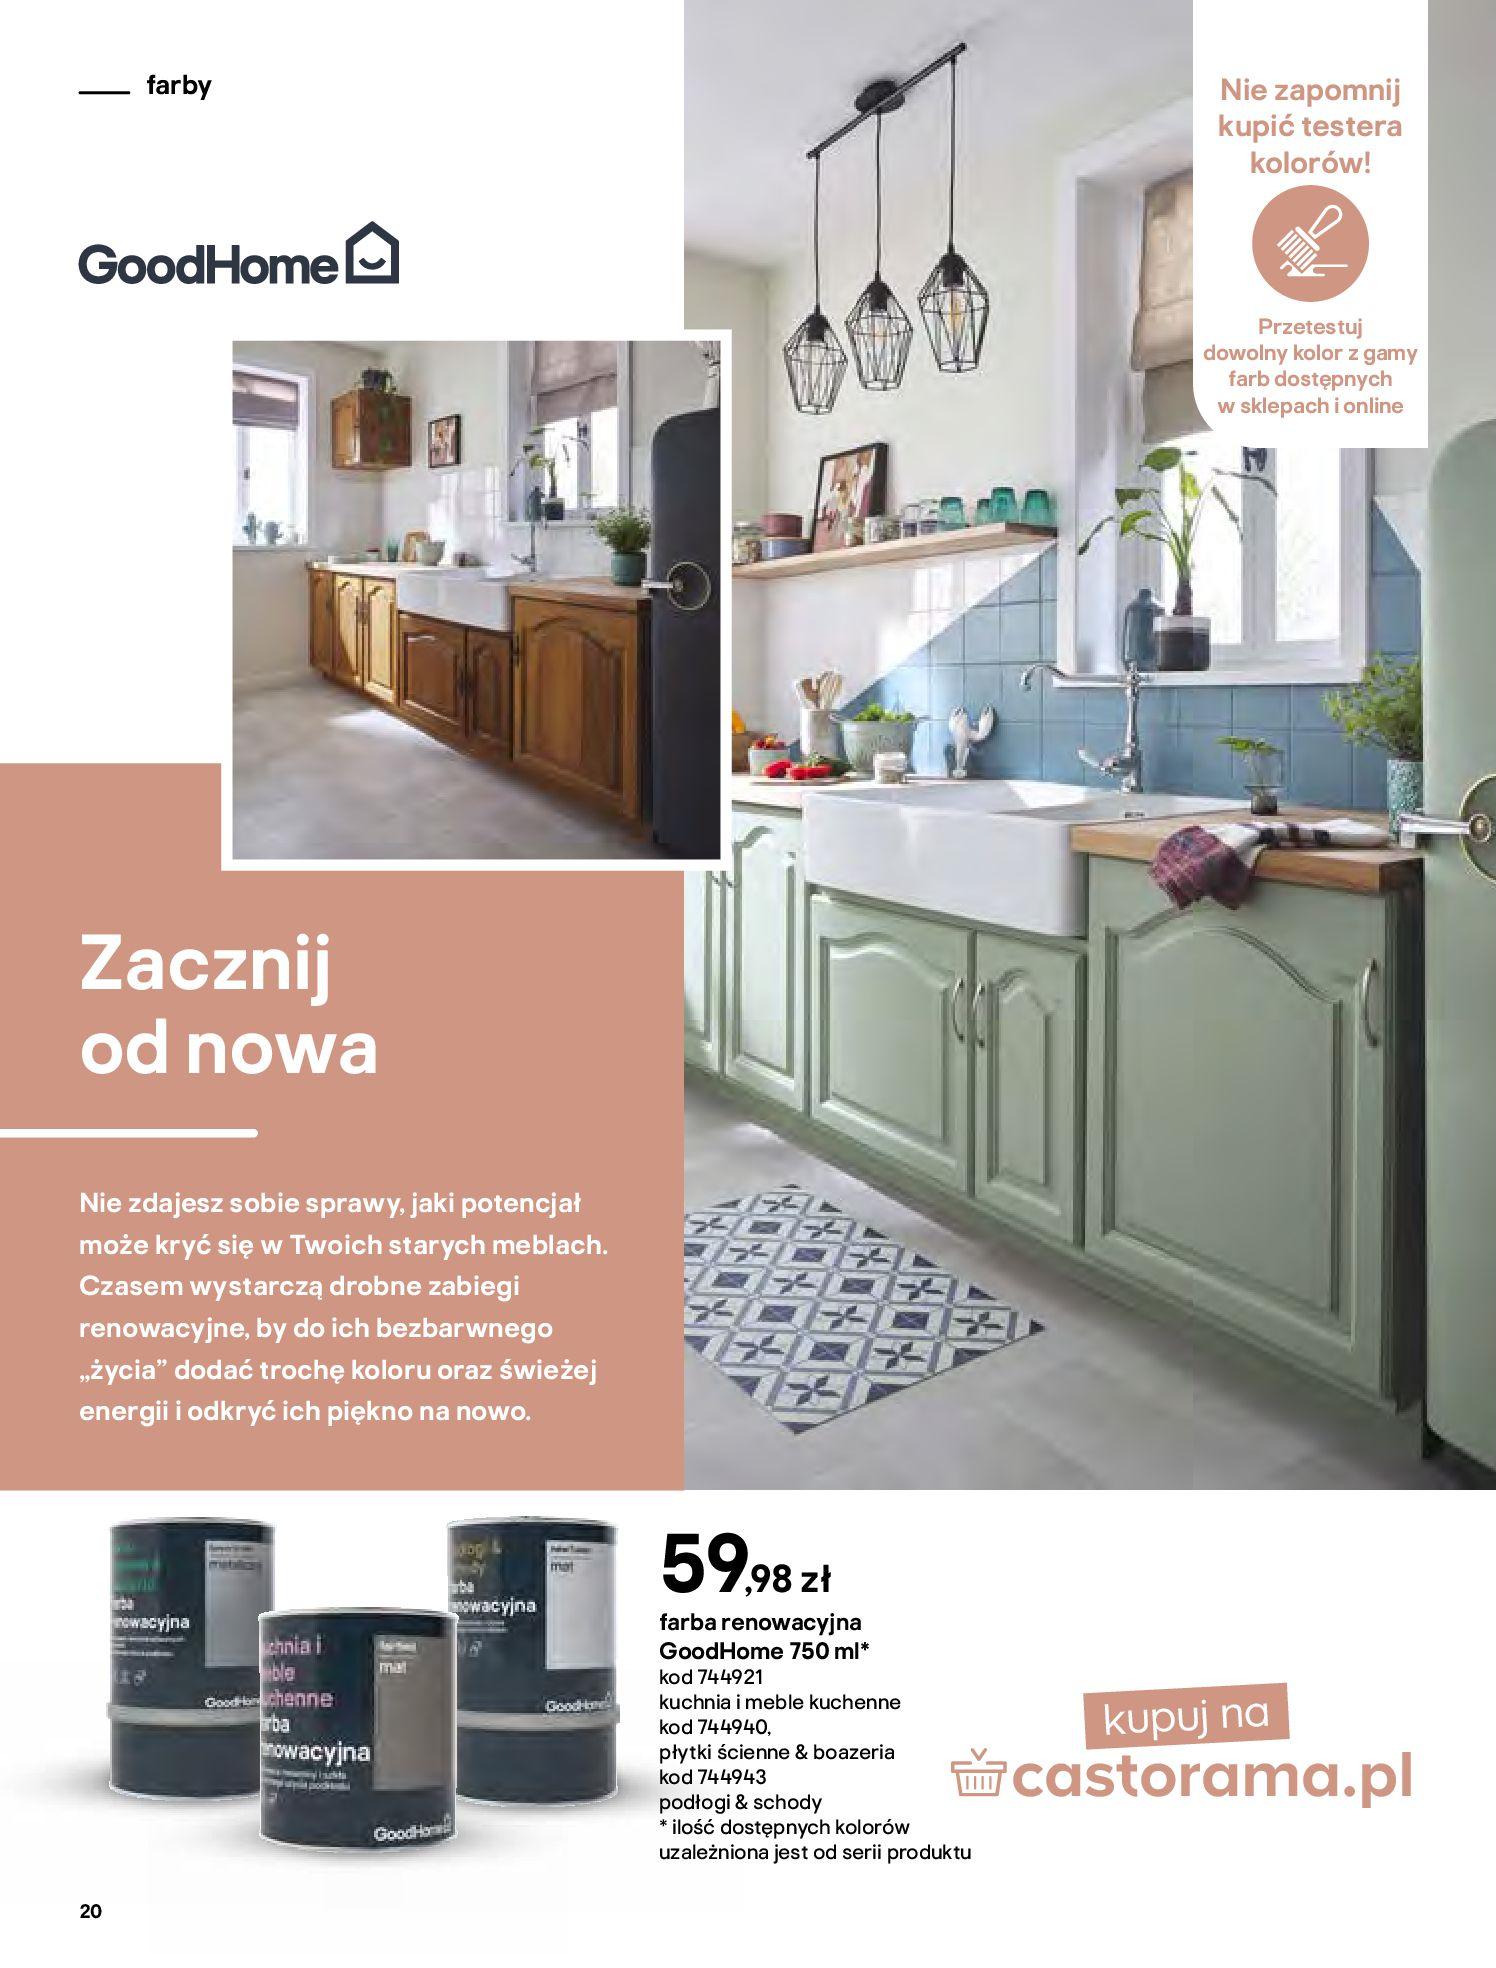 Gazetka Castorama - Katalog Dekoracje-22.10.2020-31.12.2020-page-20